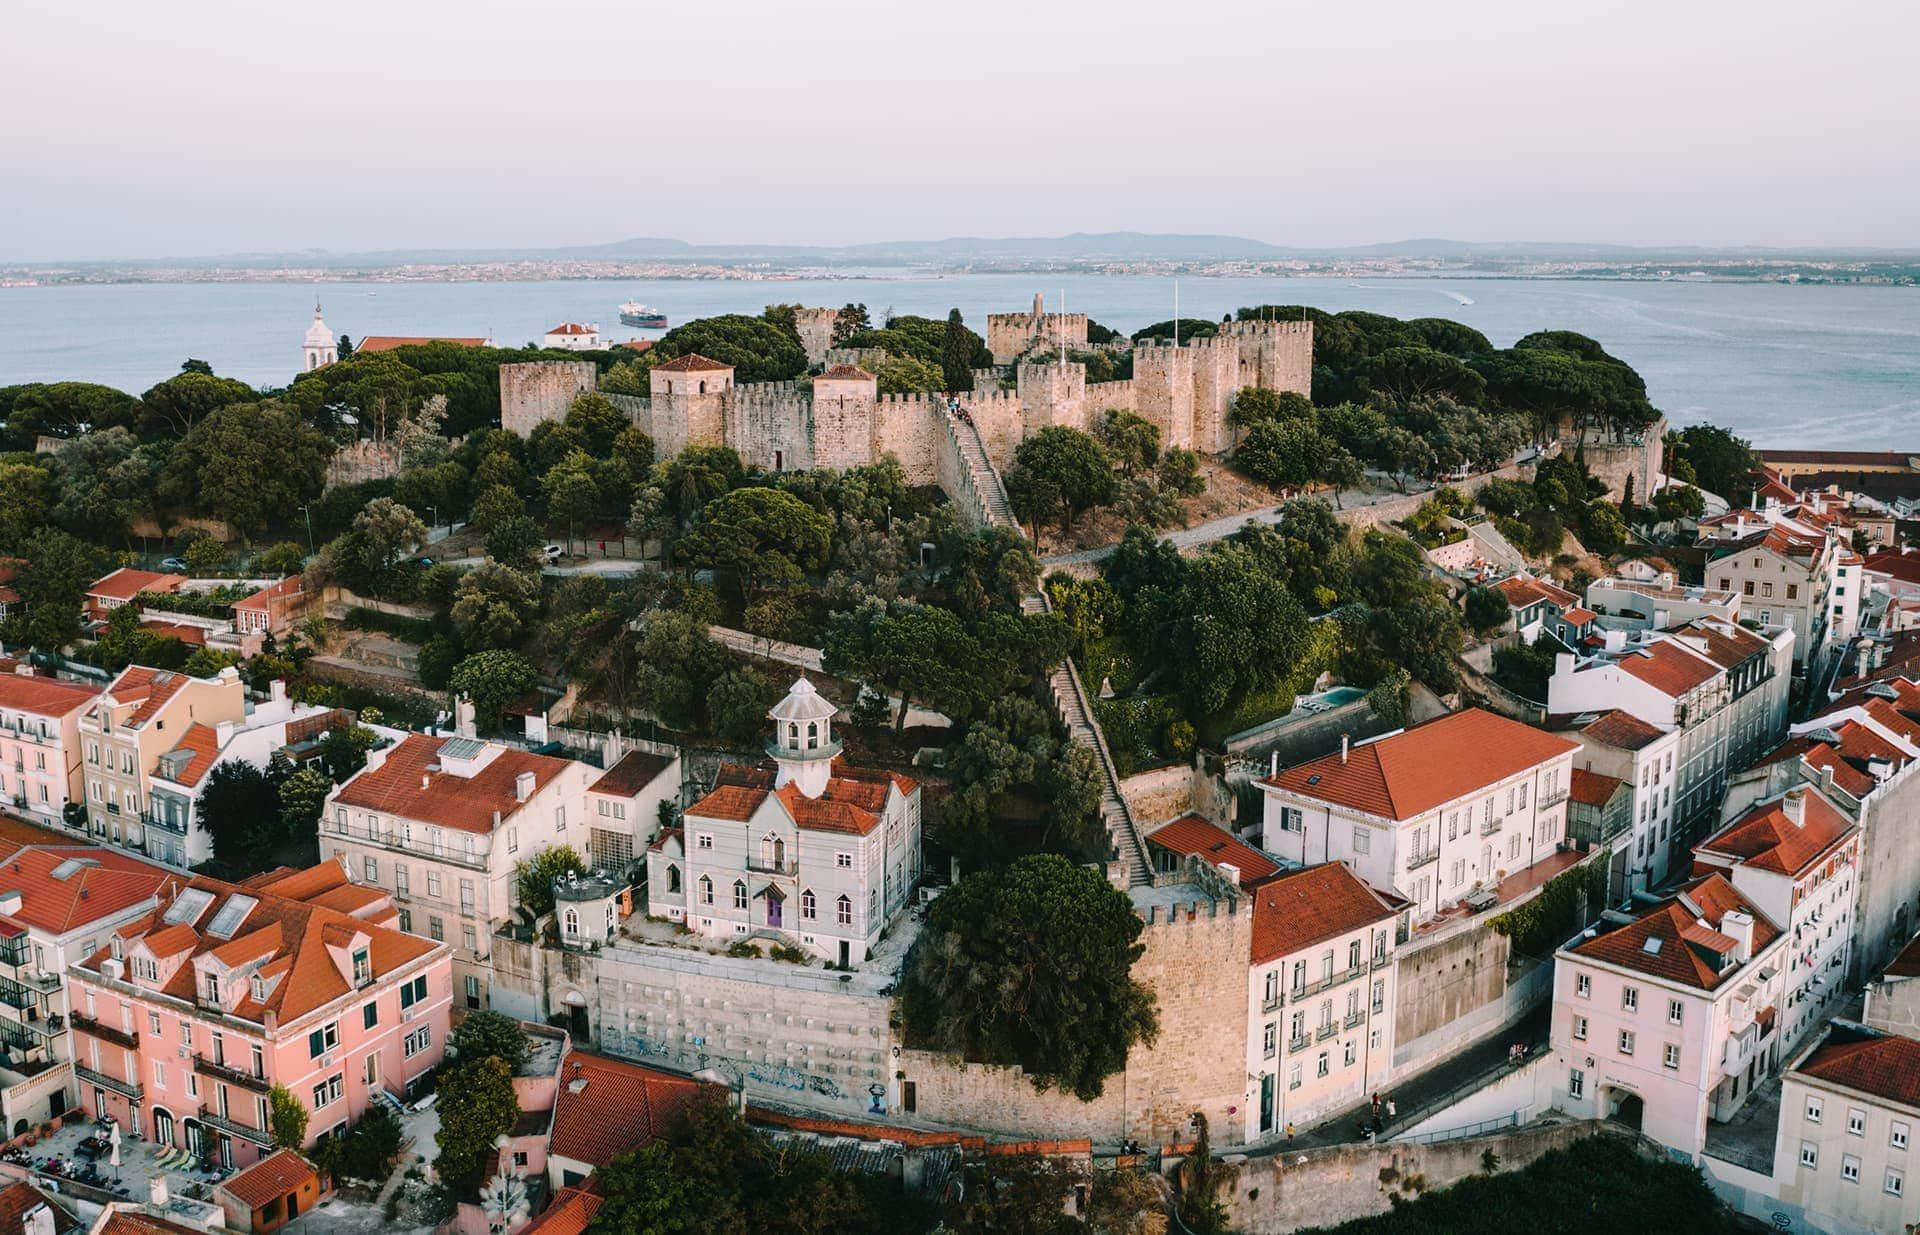 Kasteel van Sint-Joris lissabon